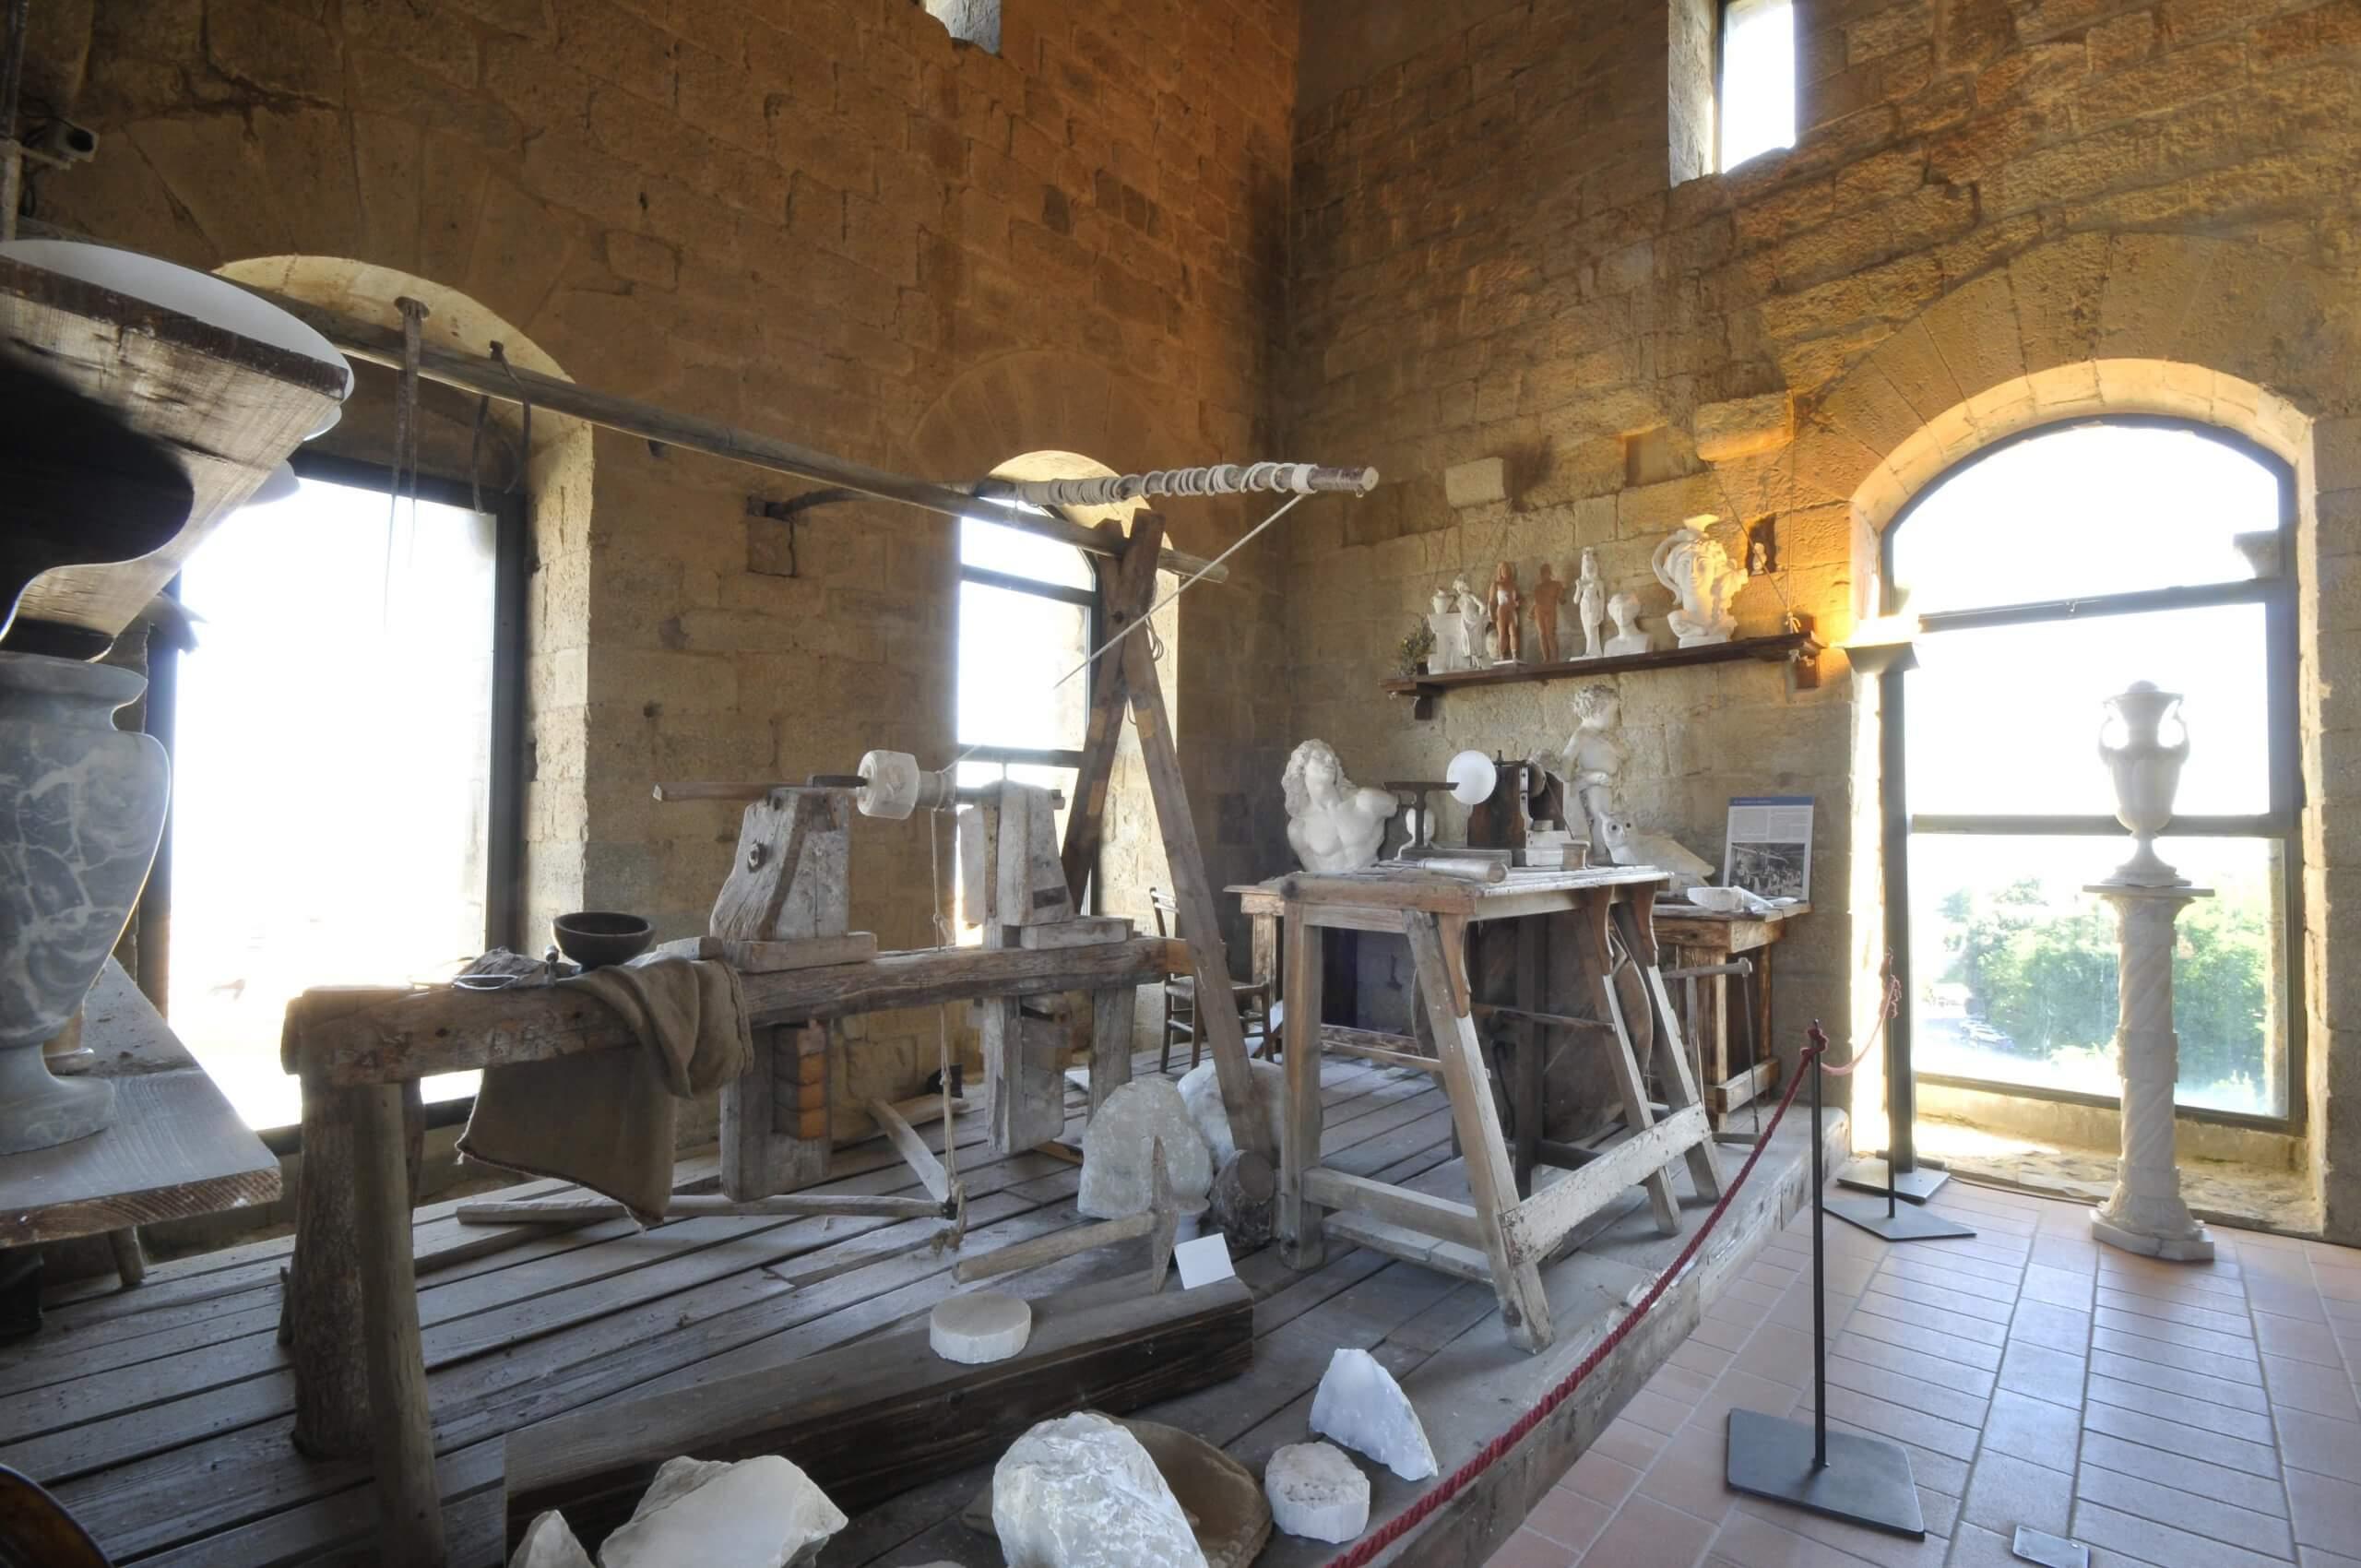 Ecomuseo dell'Alabastro a Volterra